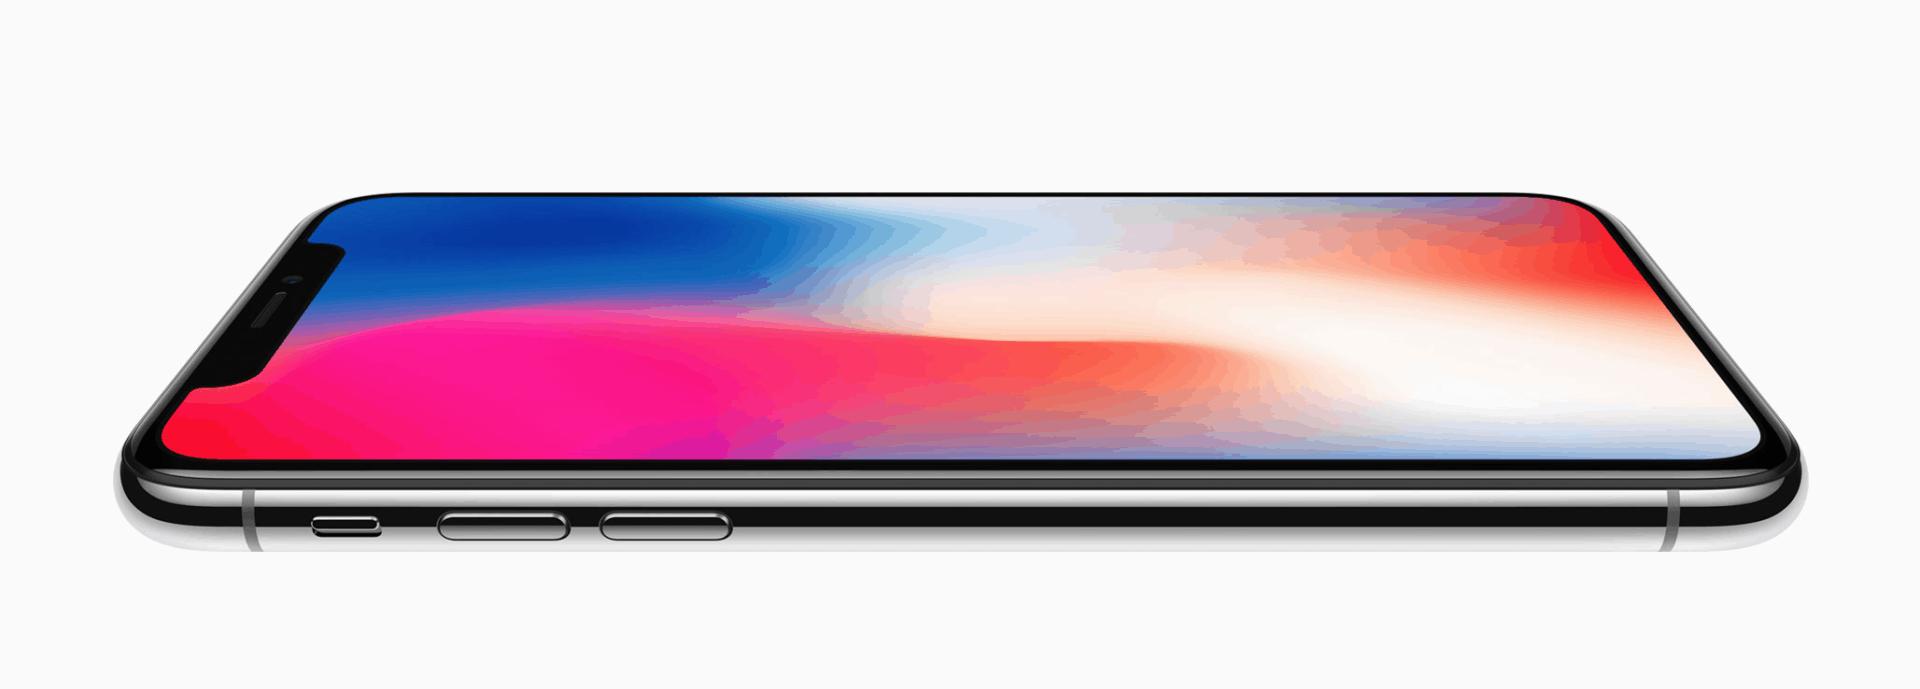 Apple iPhone X: nový design, technologie a cena